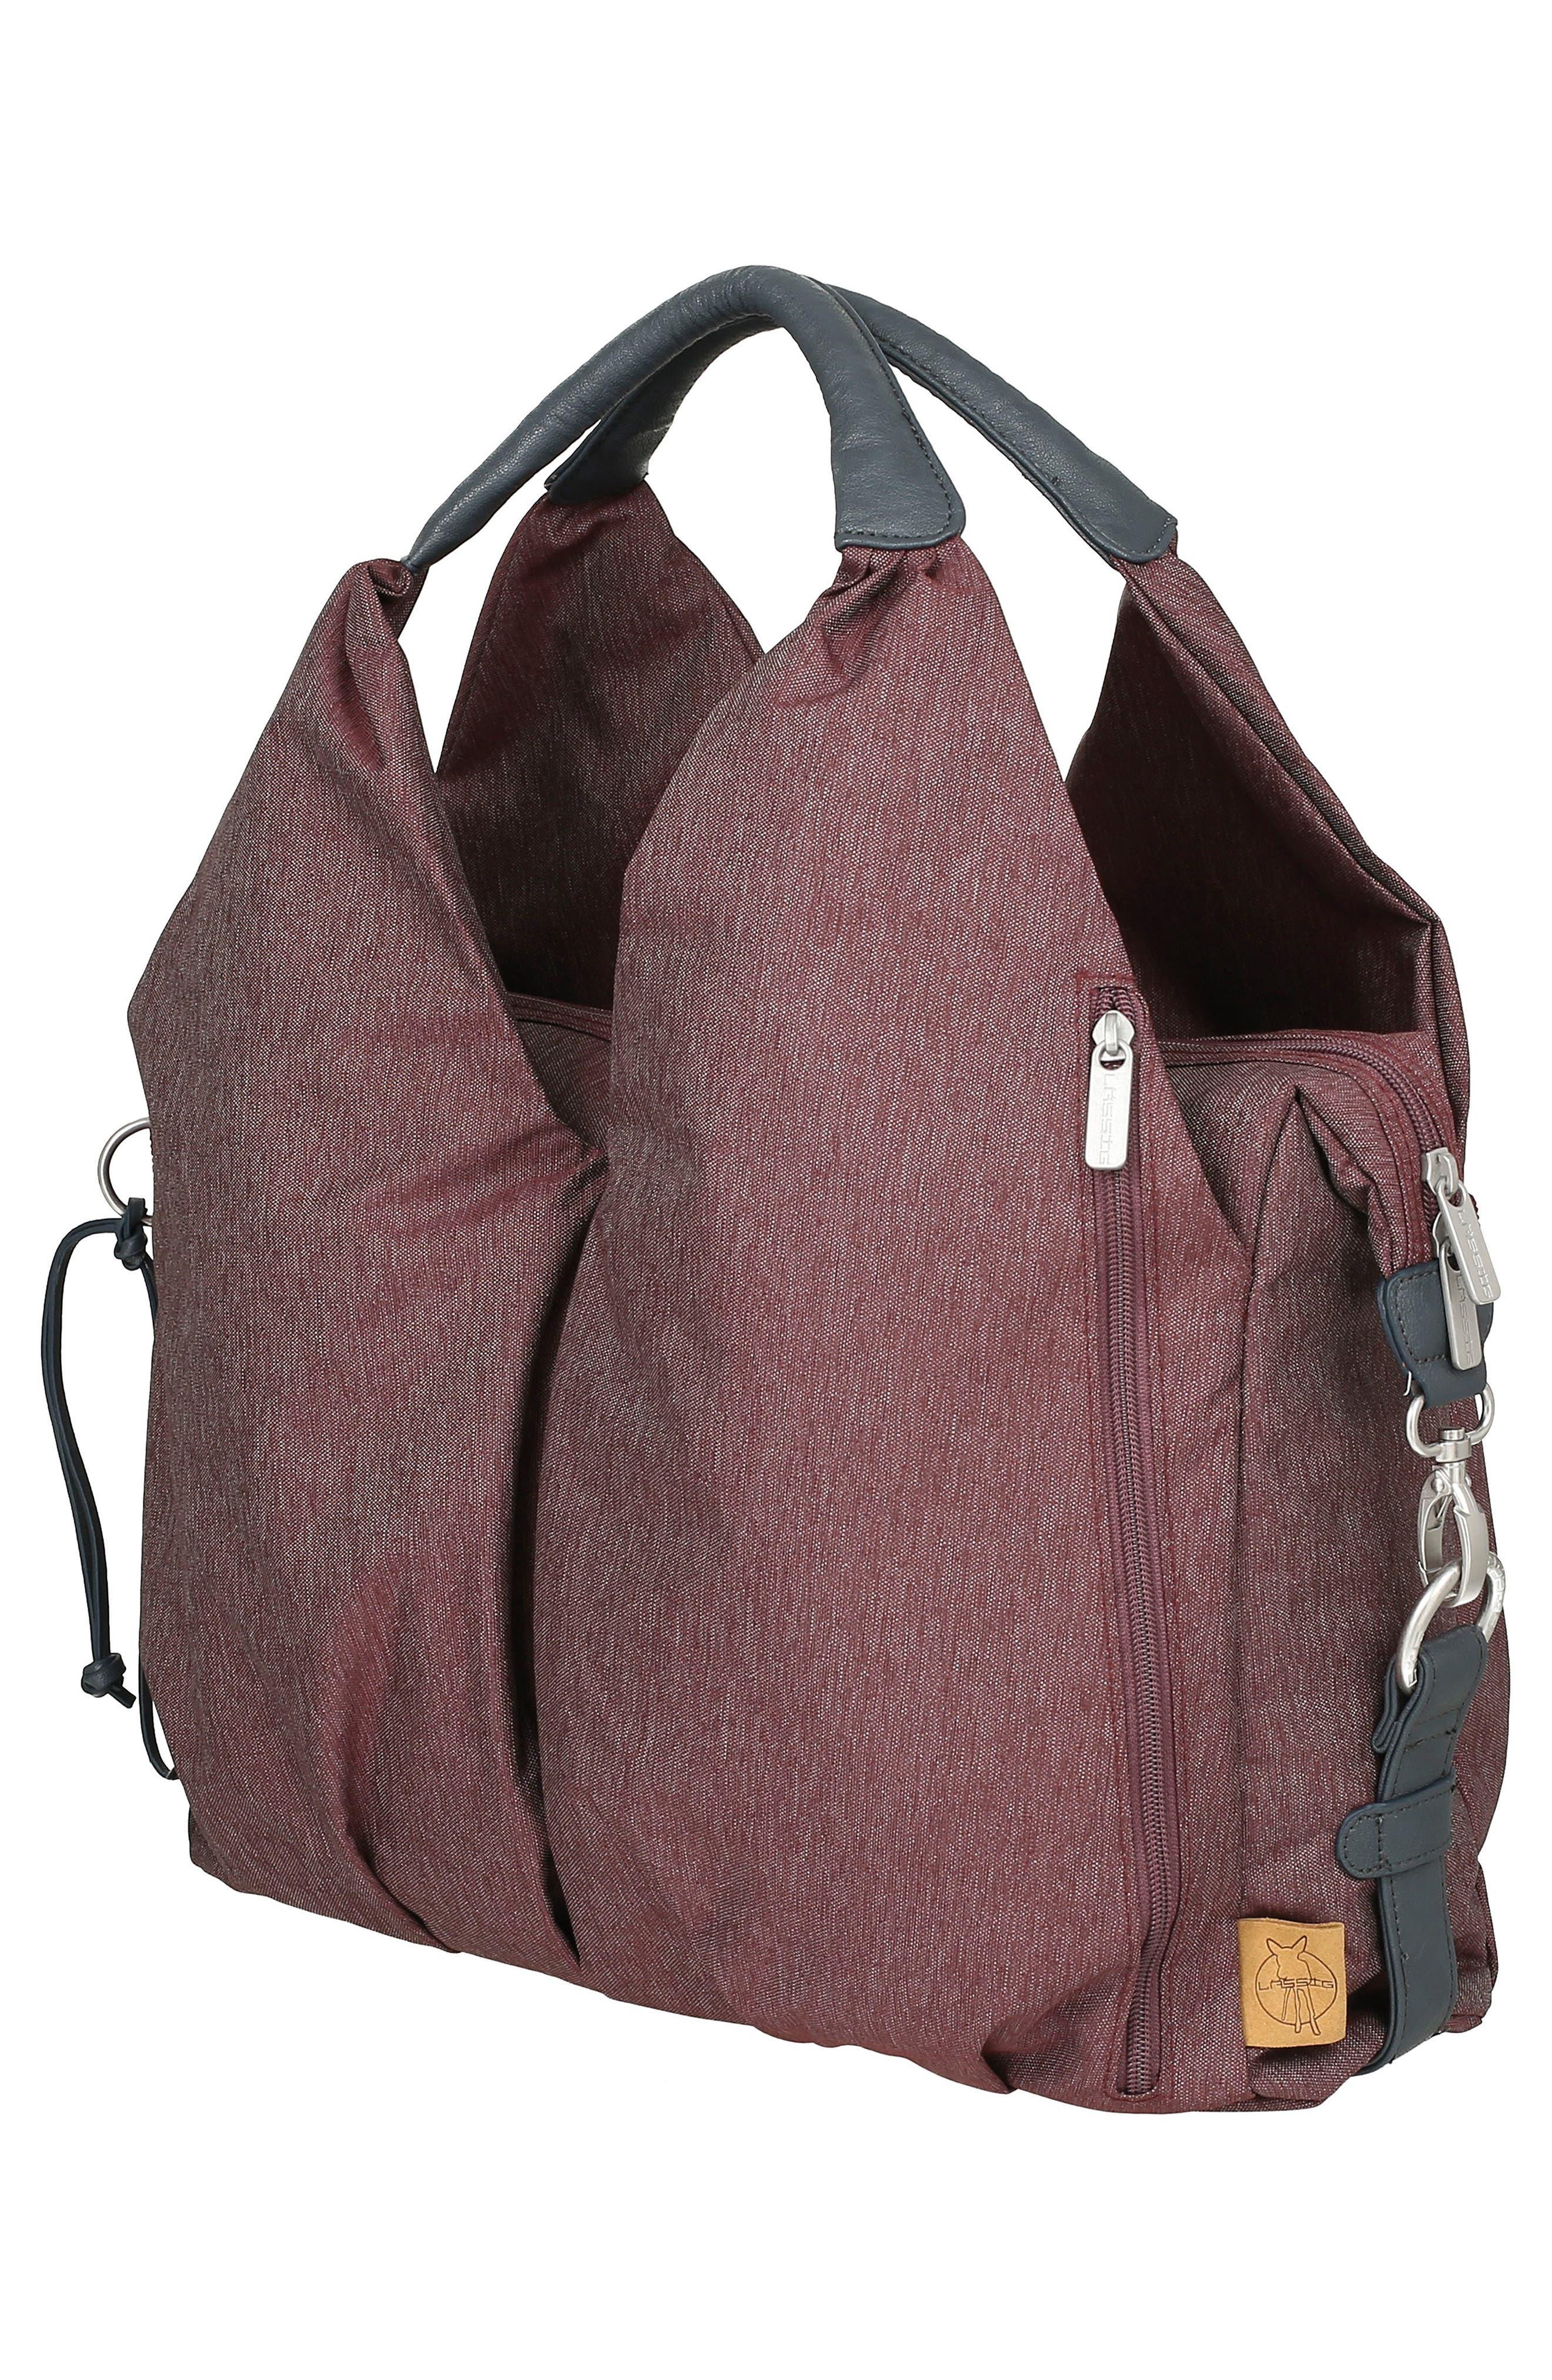 Alternate Image 2  - Lässig 'Green Label - Neckline' Diaper Bag